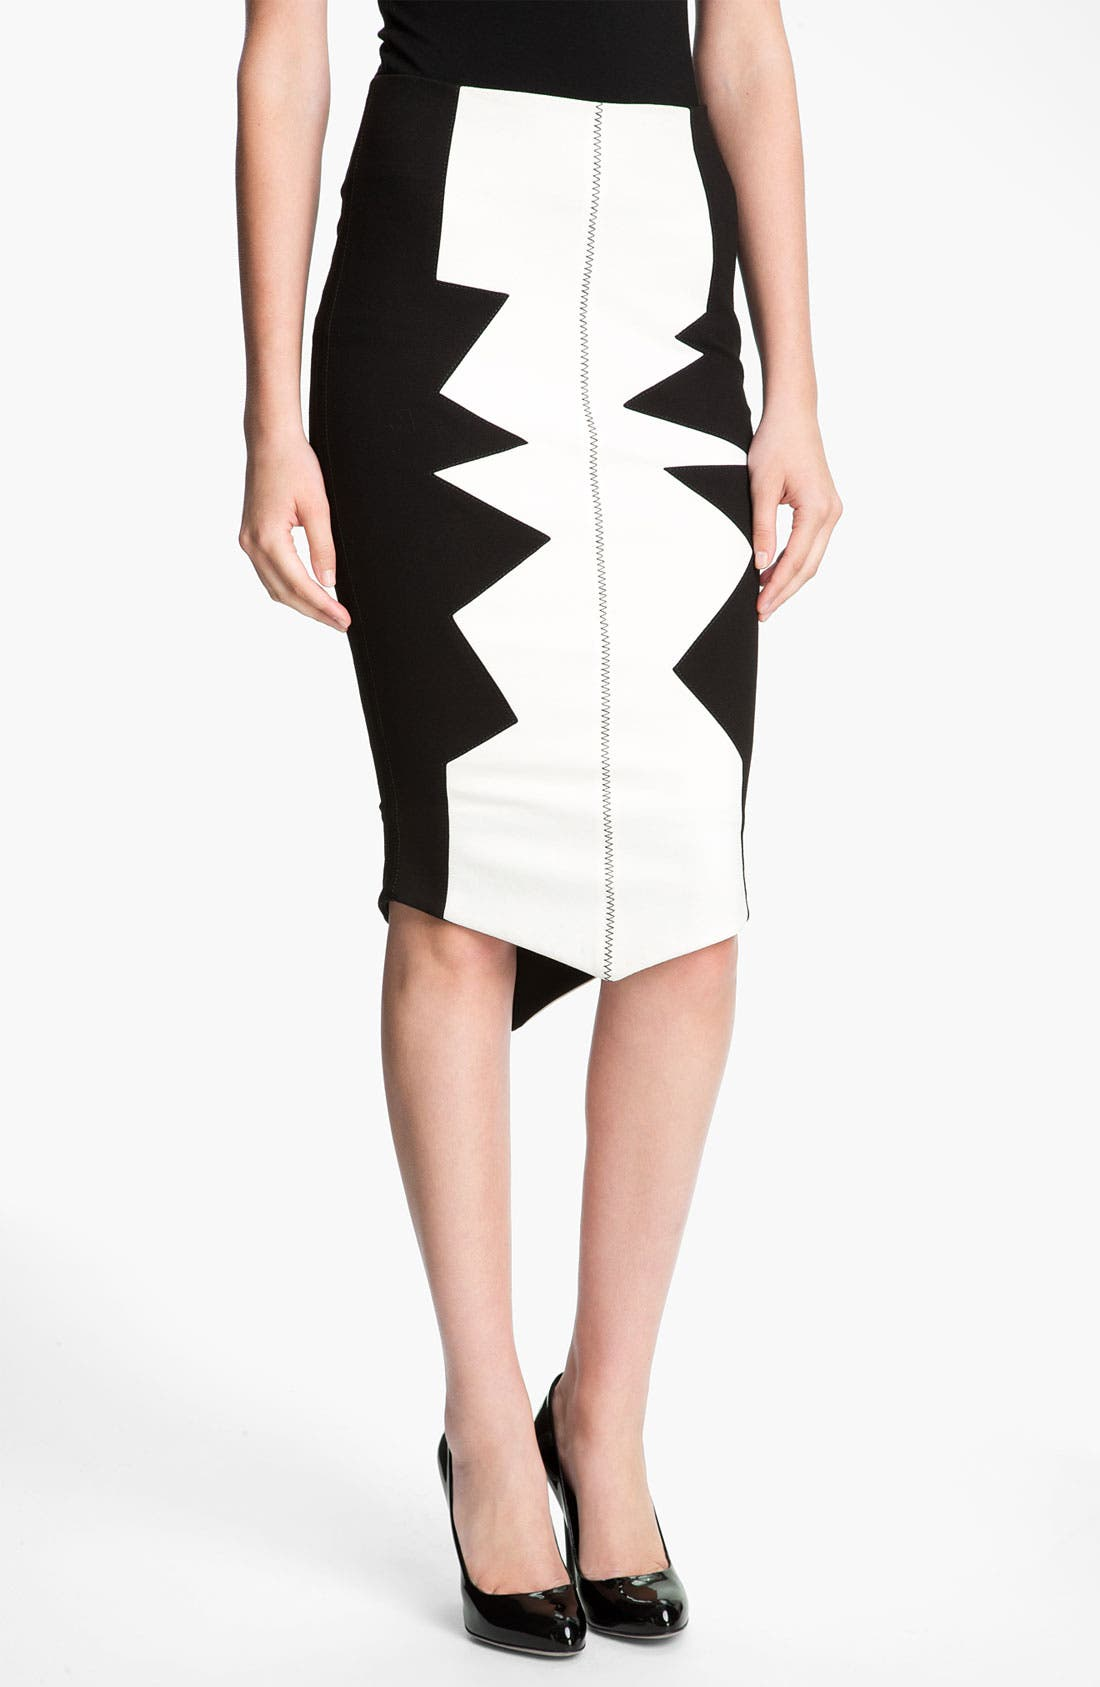 Main Image - Kelly Wearstler 'Organto' Contrast Panel Knit Pencil Skirt